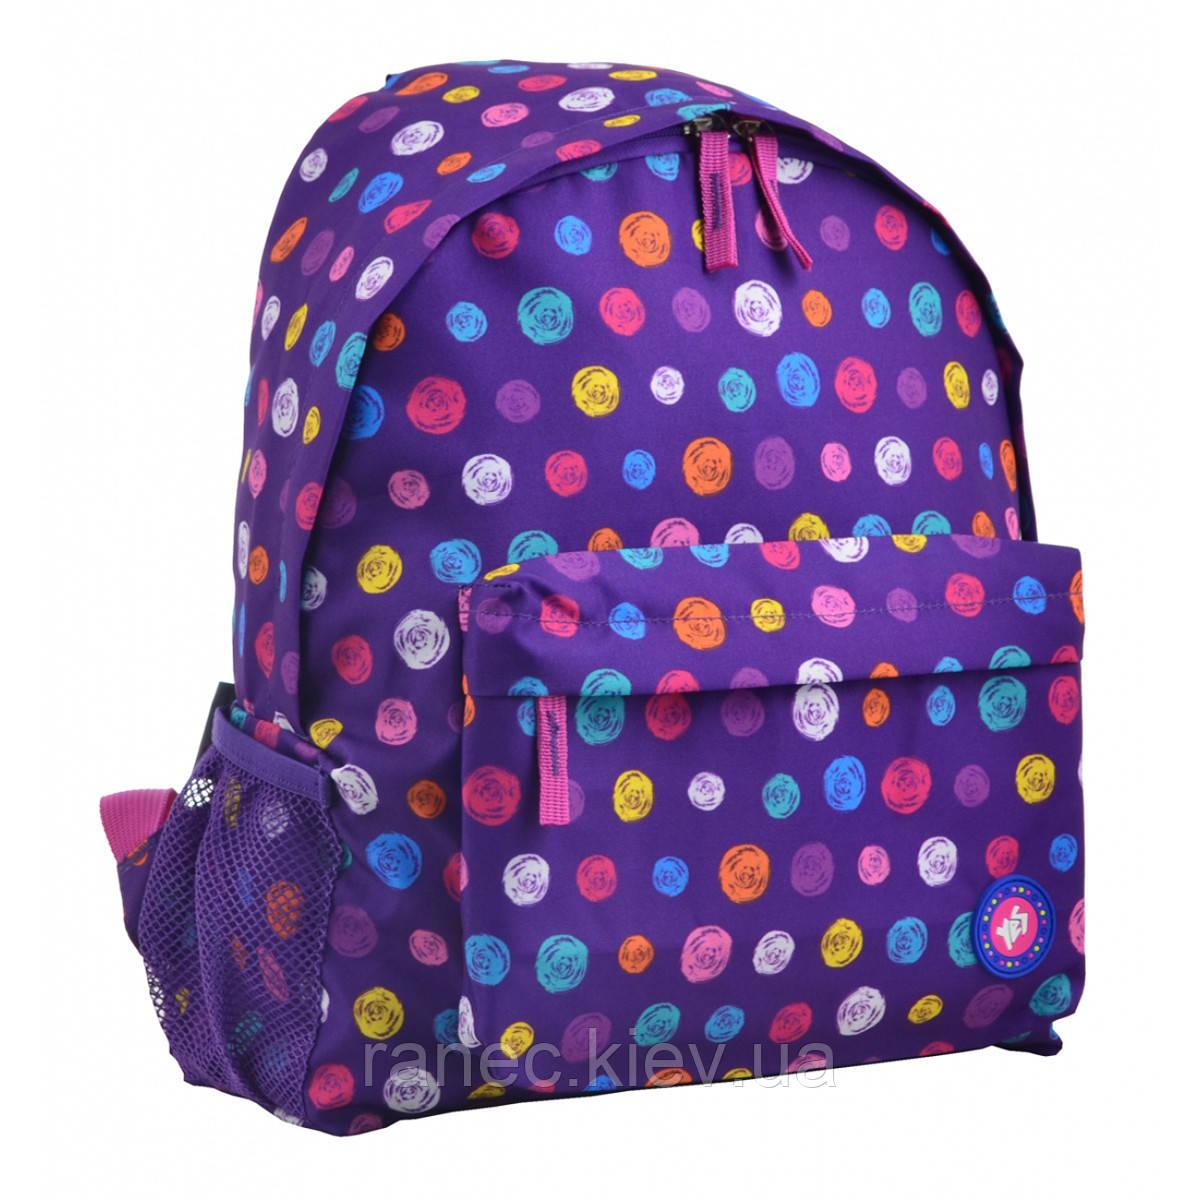 Рюкзак молодежный ST-33 Pumpy 35*29*12 555495 Yes